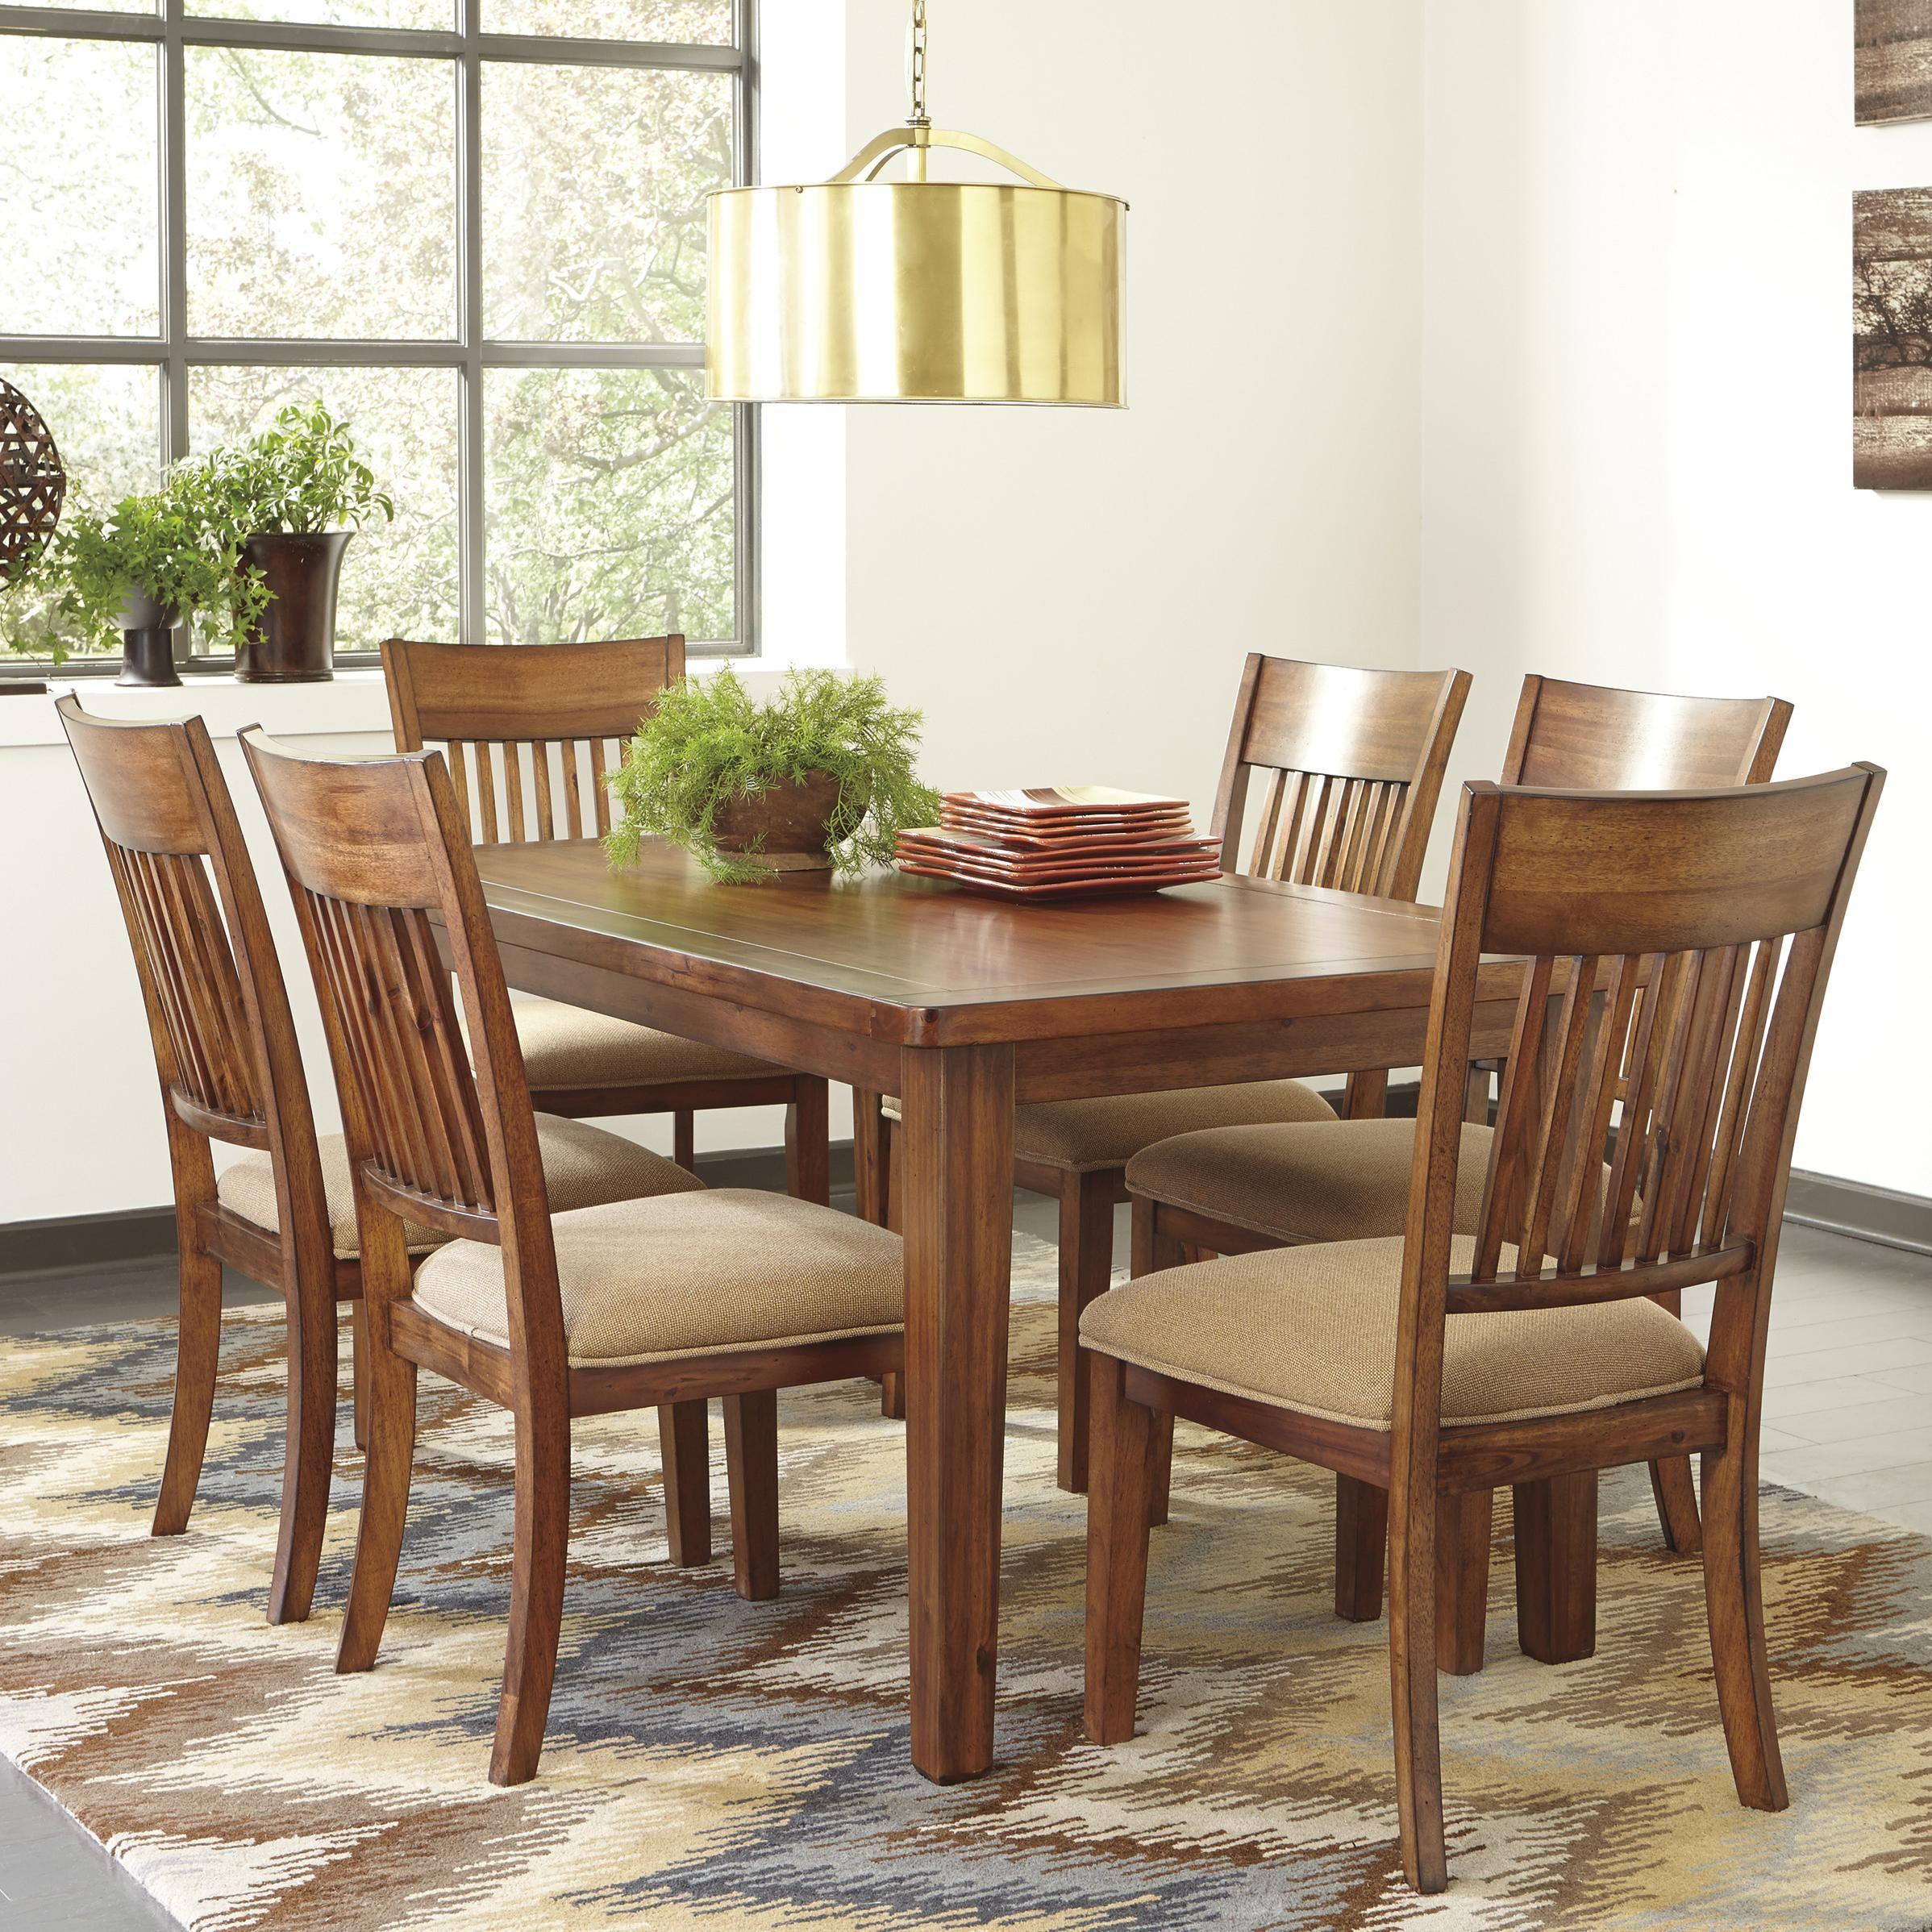 Shallibay 7 Piece Rectangular Table Set By Signature Design